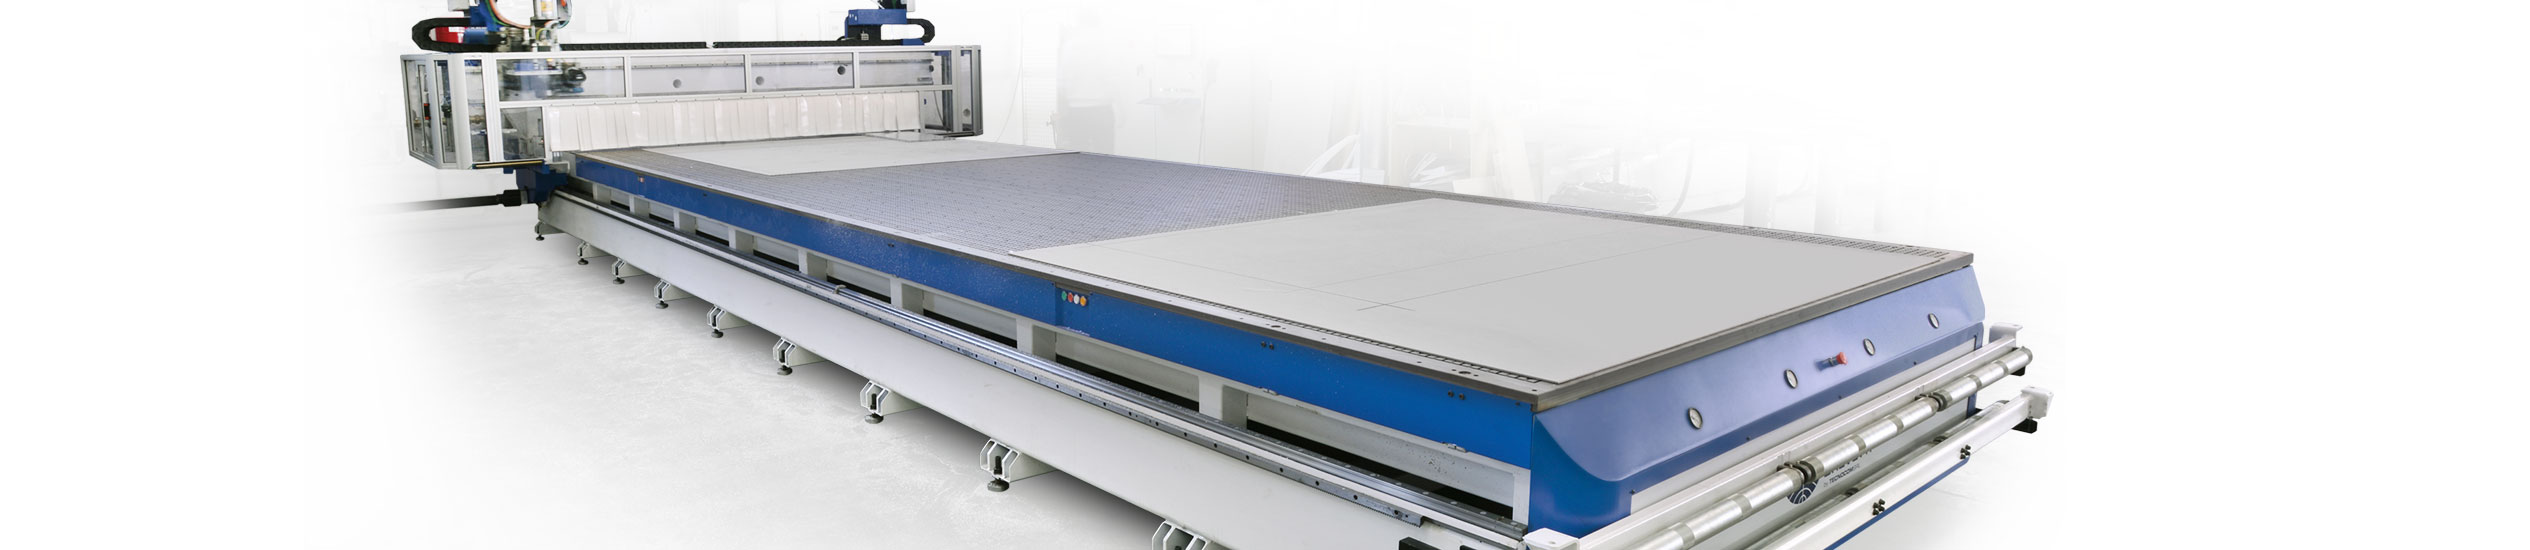 large scale cnc machine - 2530×550